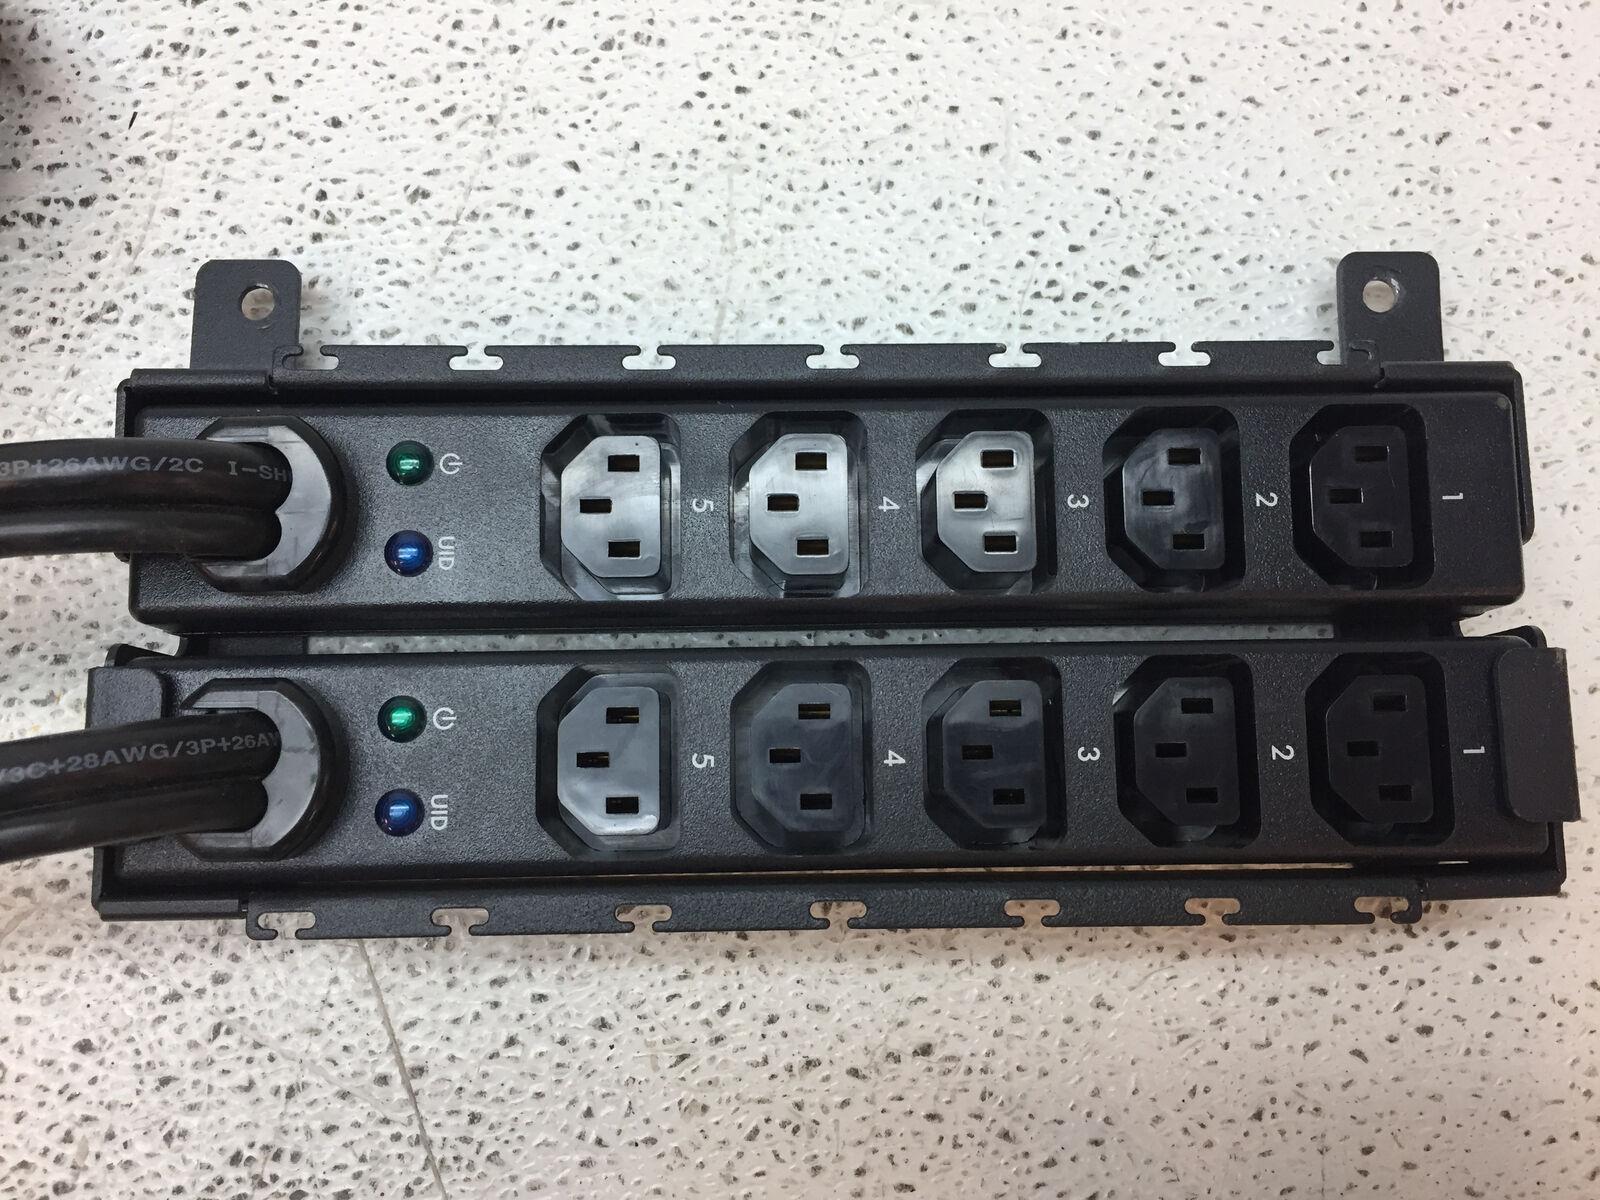 Lot of 2 HP 533780-001 Modular PDU Extension Bar 16A//200-240V 5x C13 AF528A